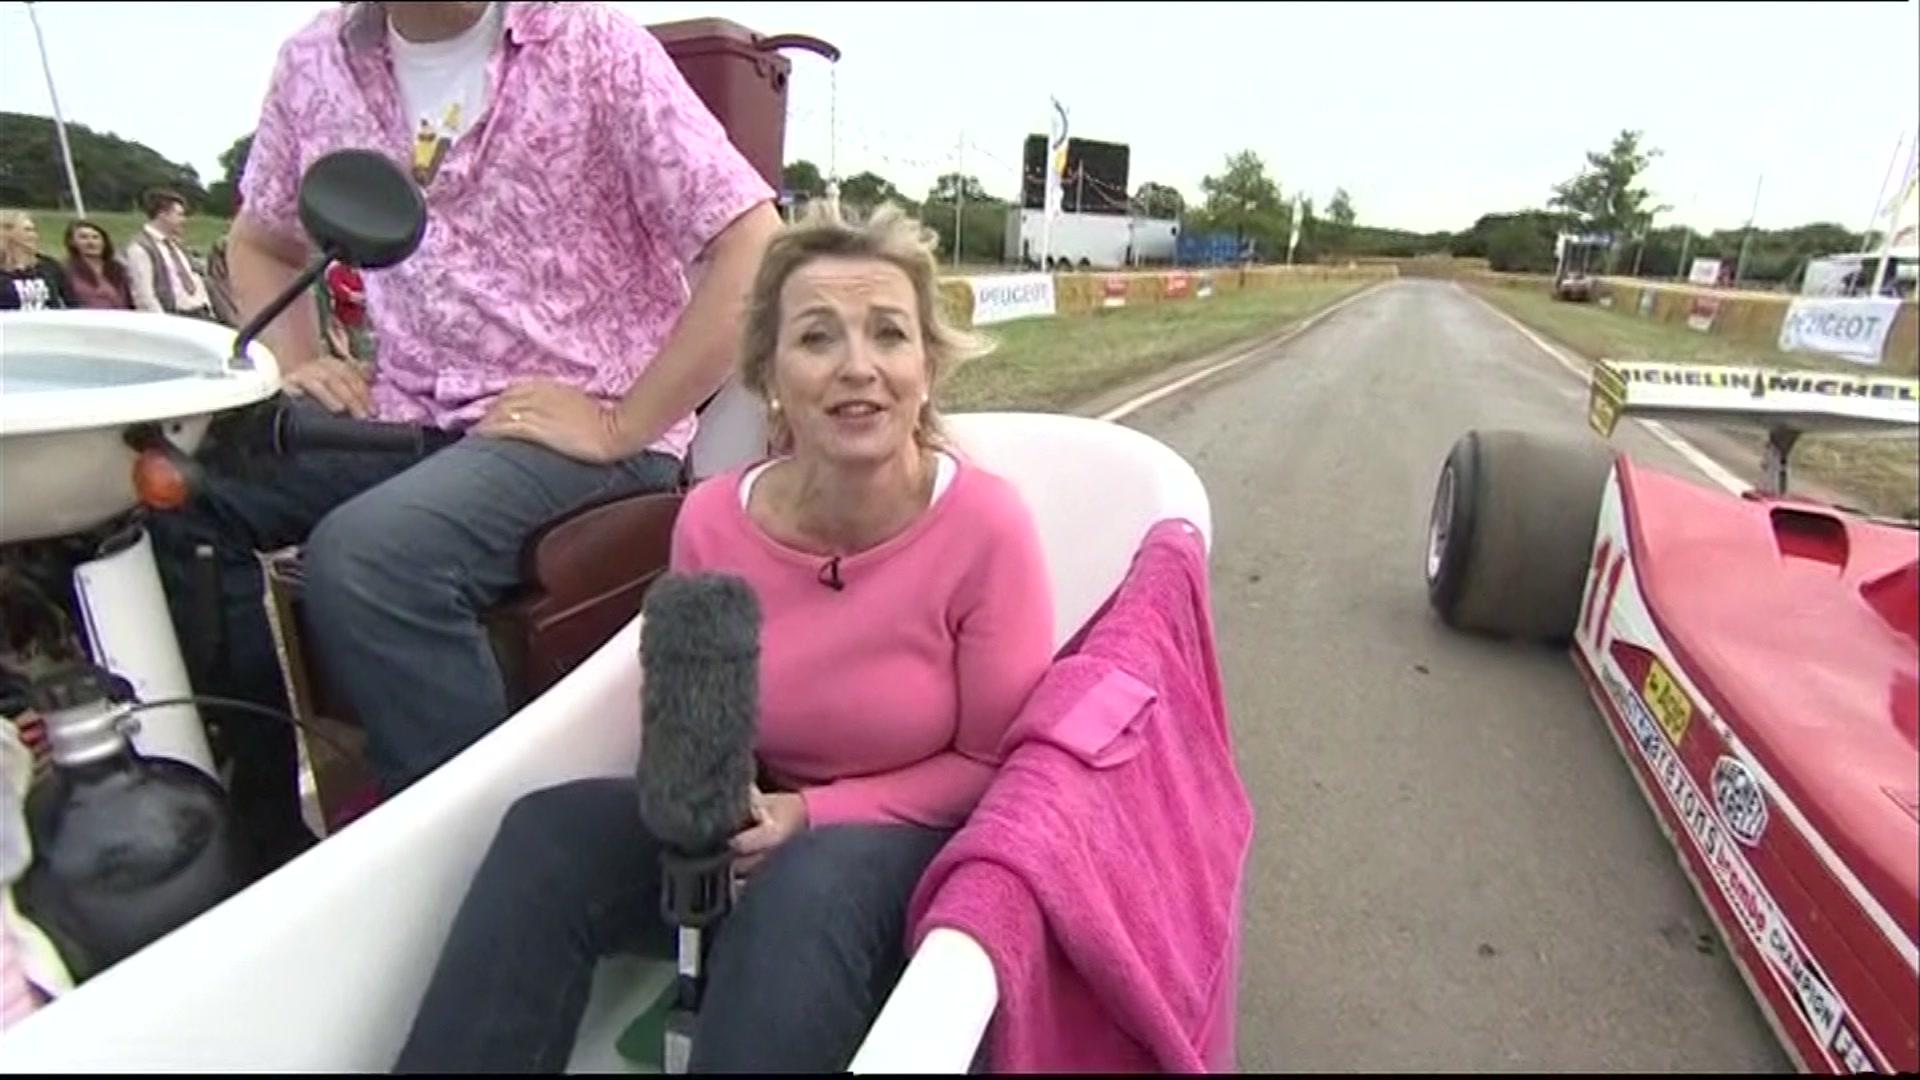 Carol Kirkwood in a motorised bathroom at a classic car festival